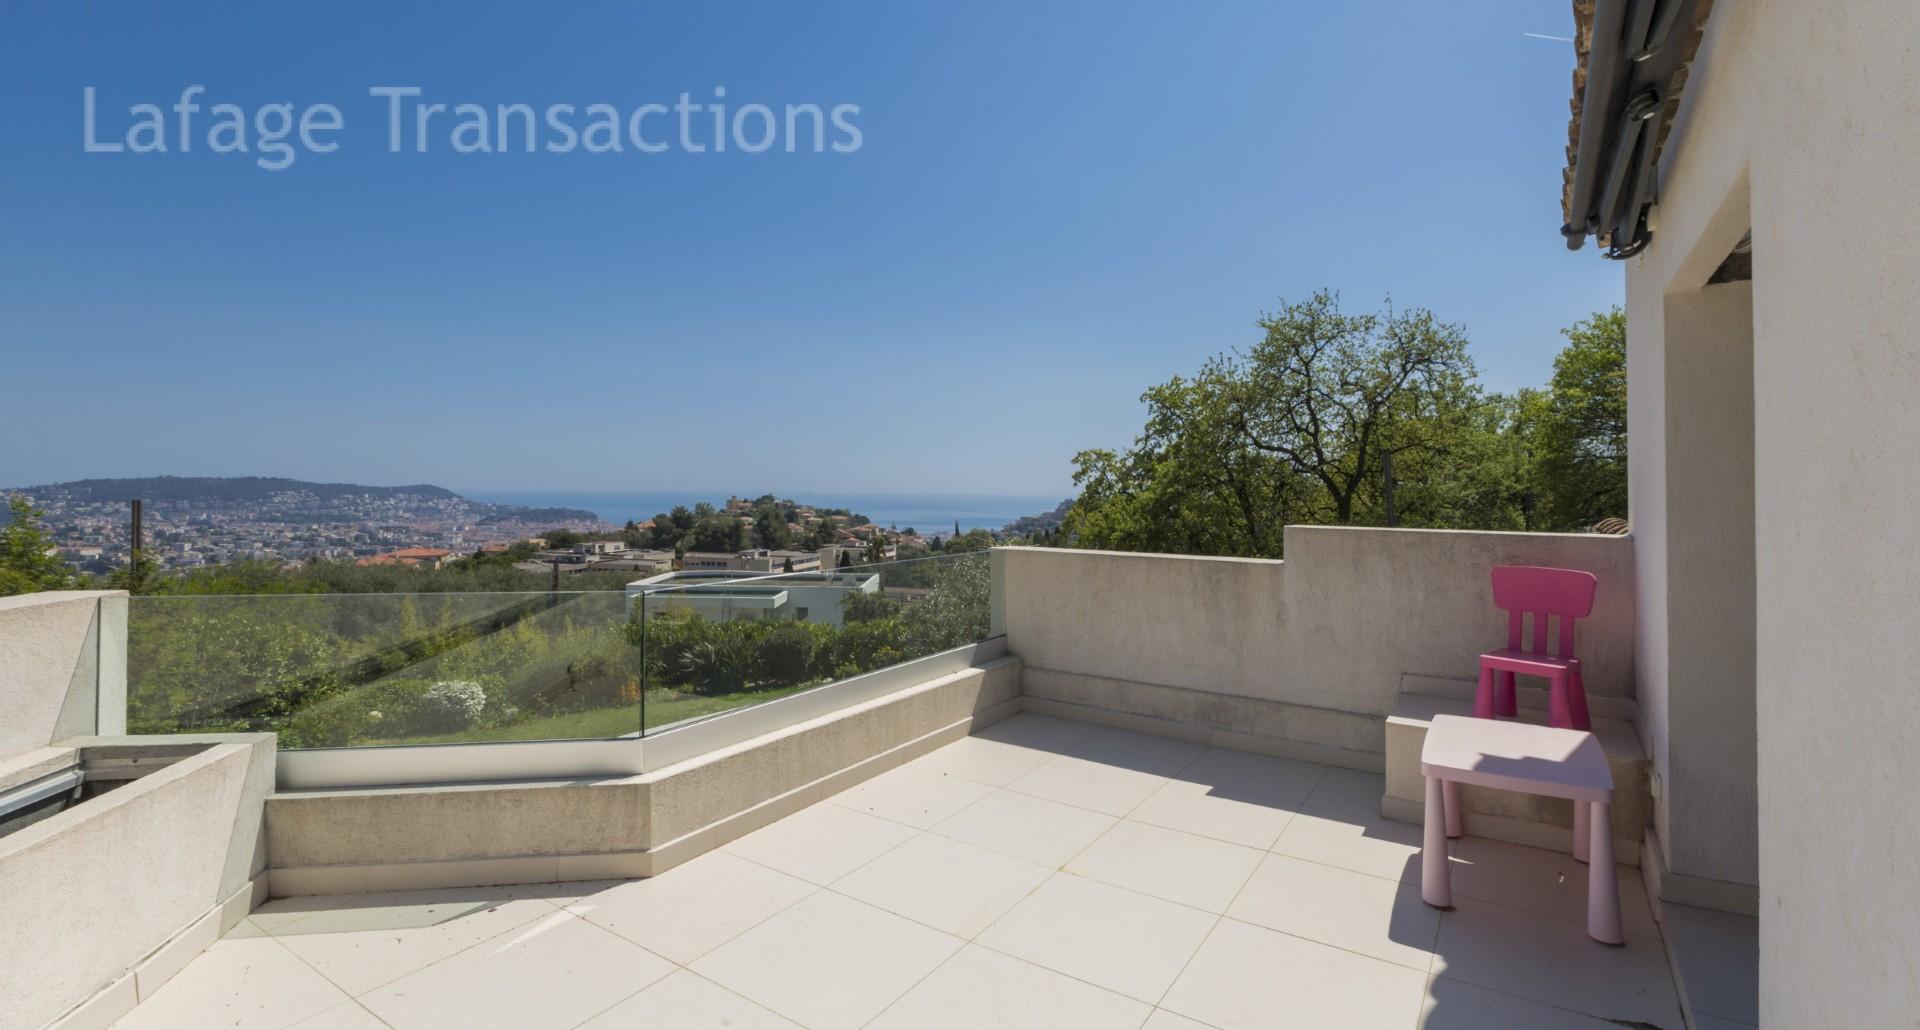 Nice pessicart villa a vendre de 240m2 terrain de 2800m2 tres jolie vue piscine lafage - Piscine pente terrain nice ...